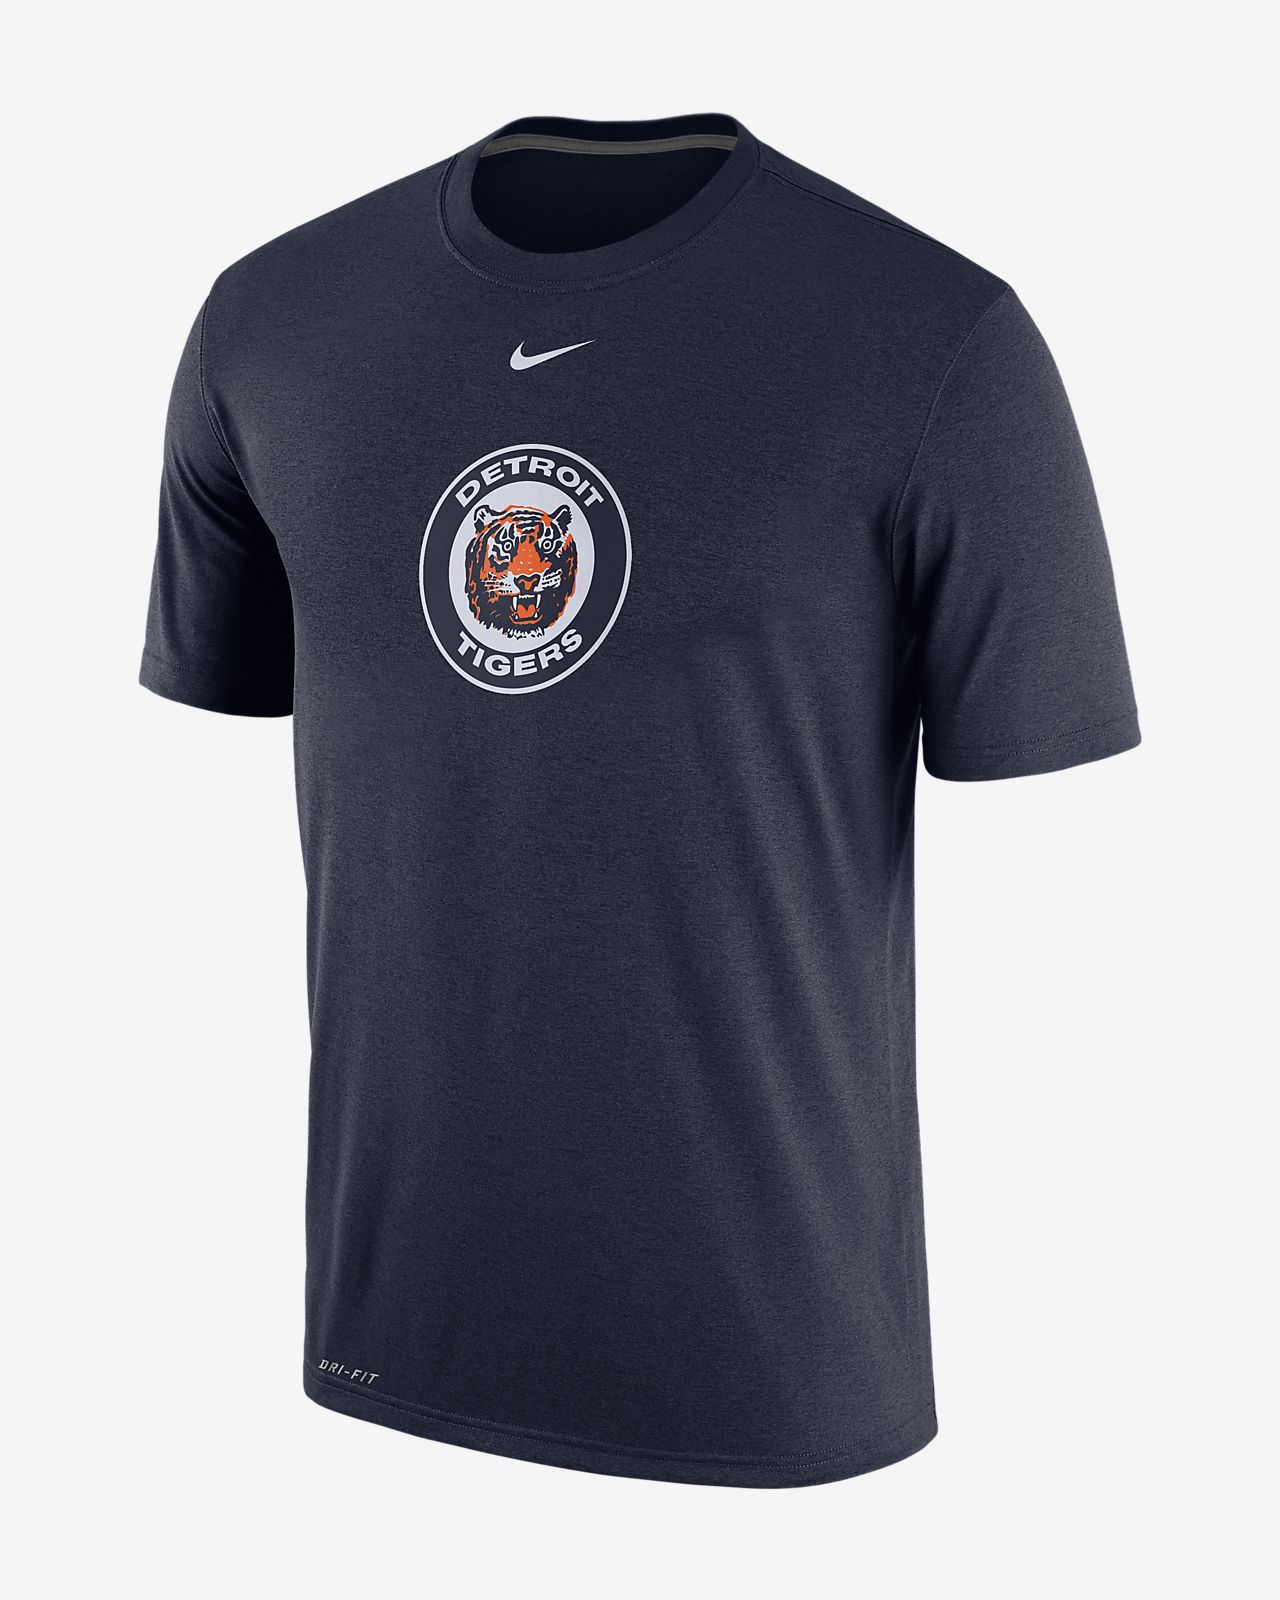 Nike Marled (MLB Tigers) Men's T-Shirts Navy